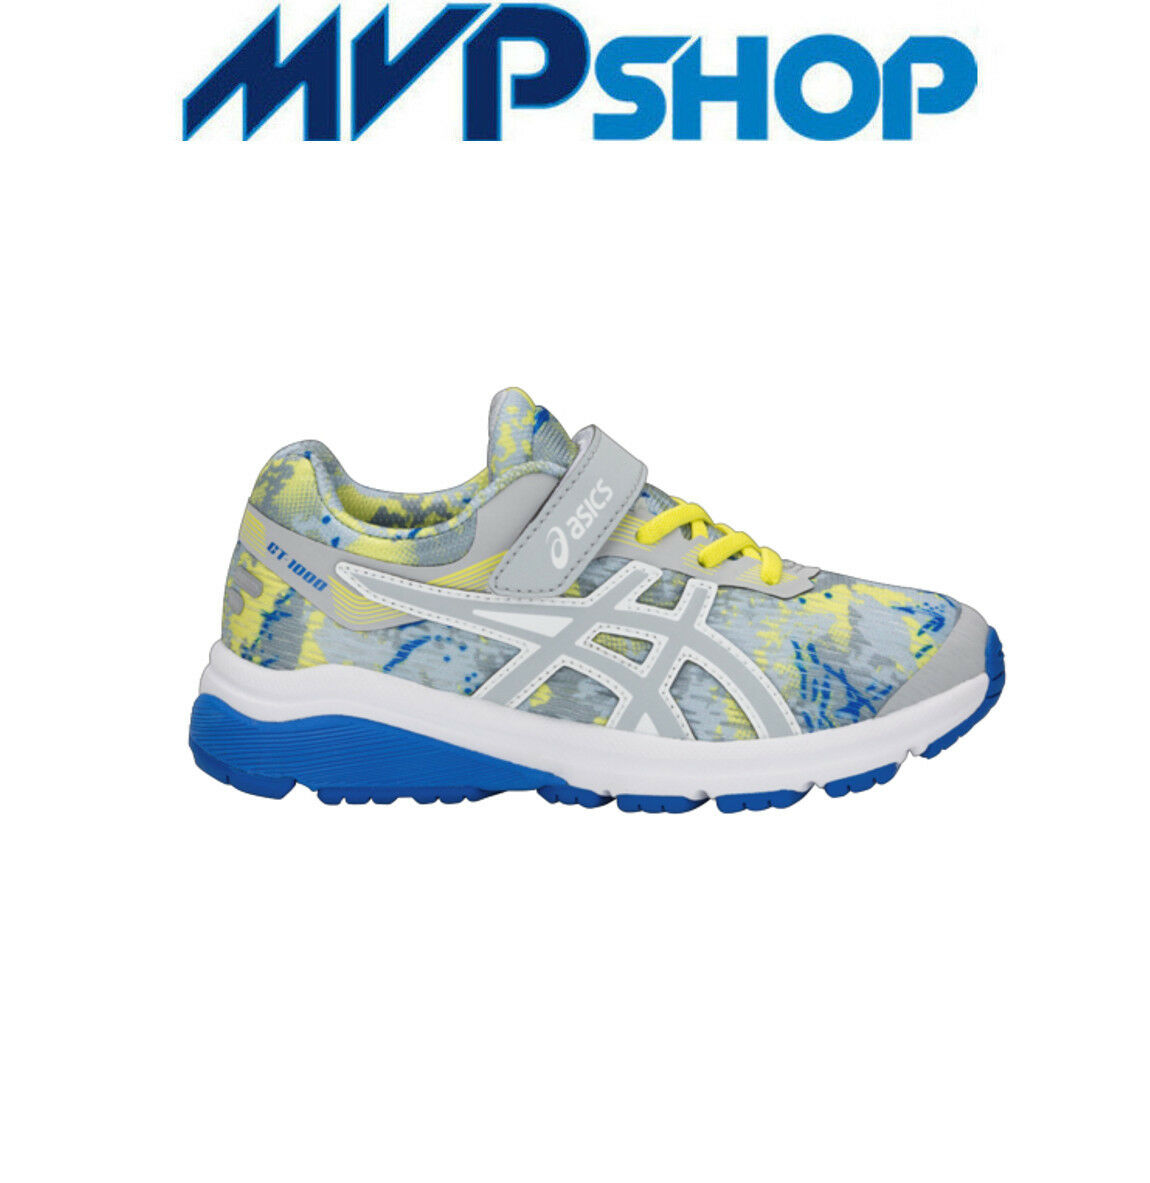 Asics GT 1000-7 PS SP shoes Running Junior  1014A045-020